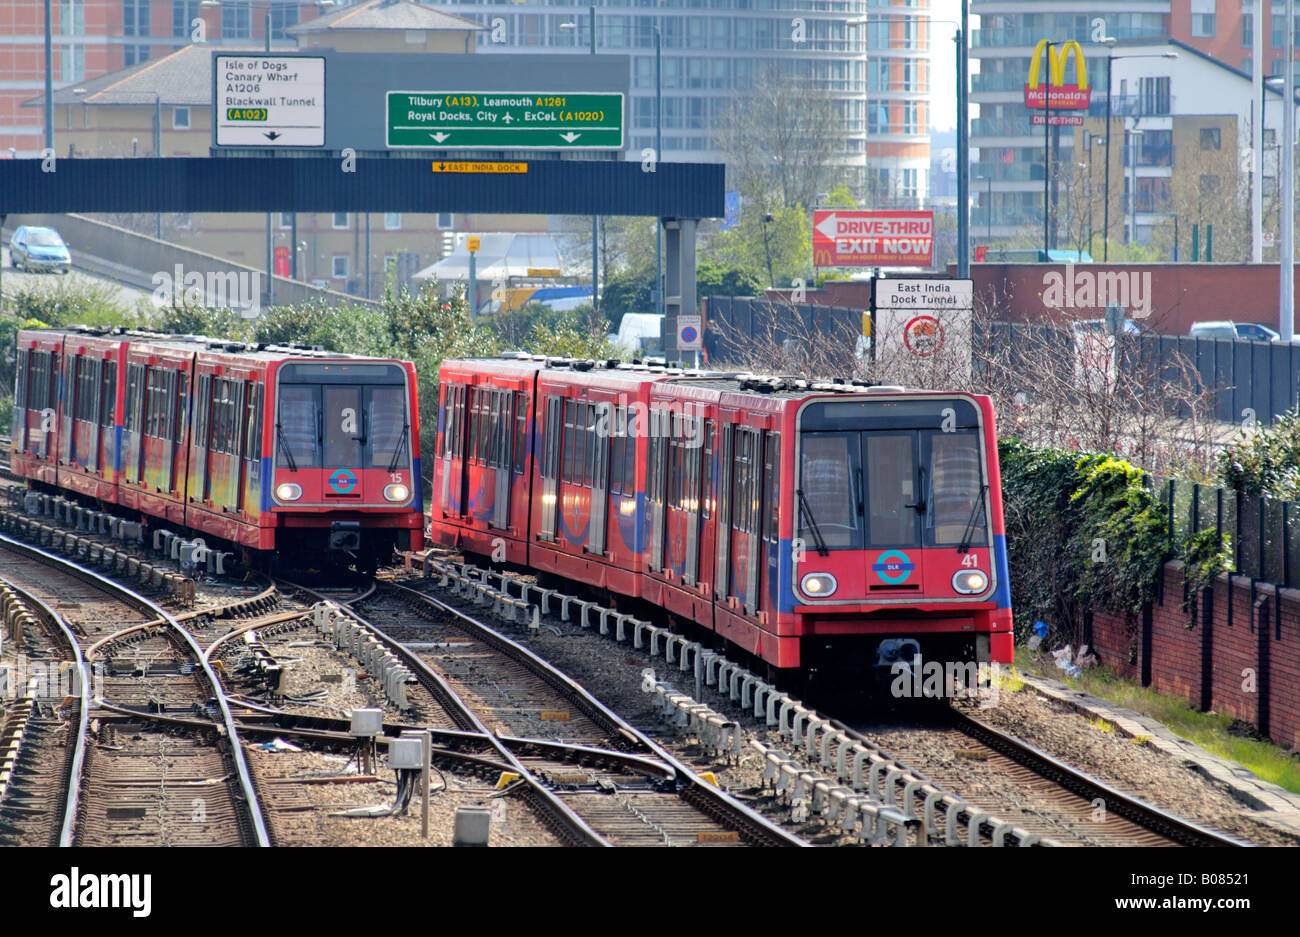 Docklands Light Railway trains London United Kingdom - Stock Image